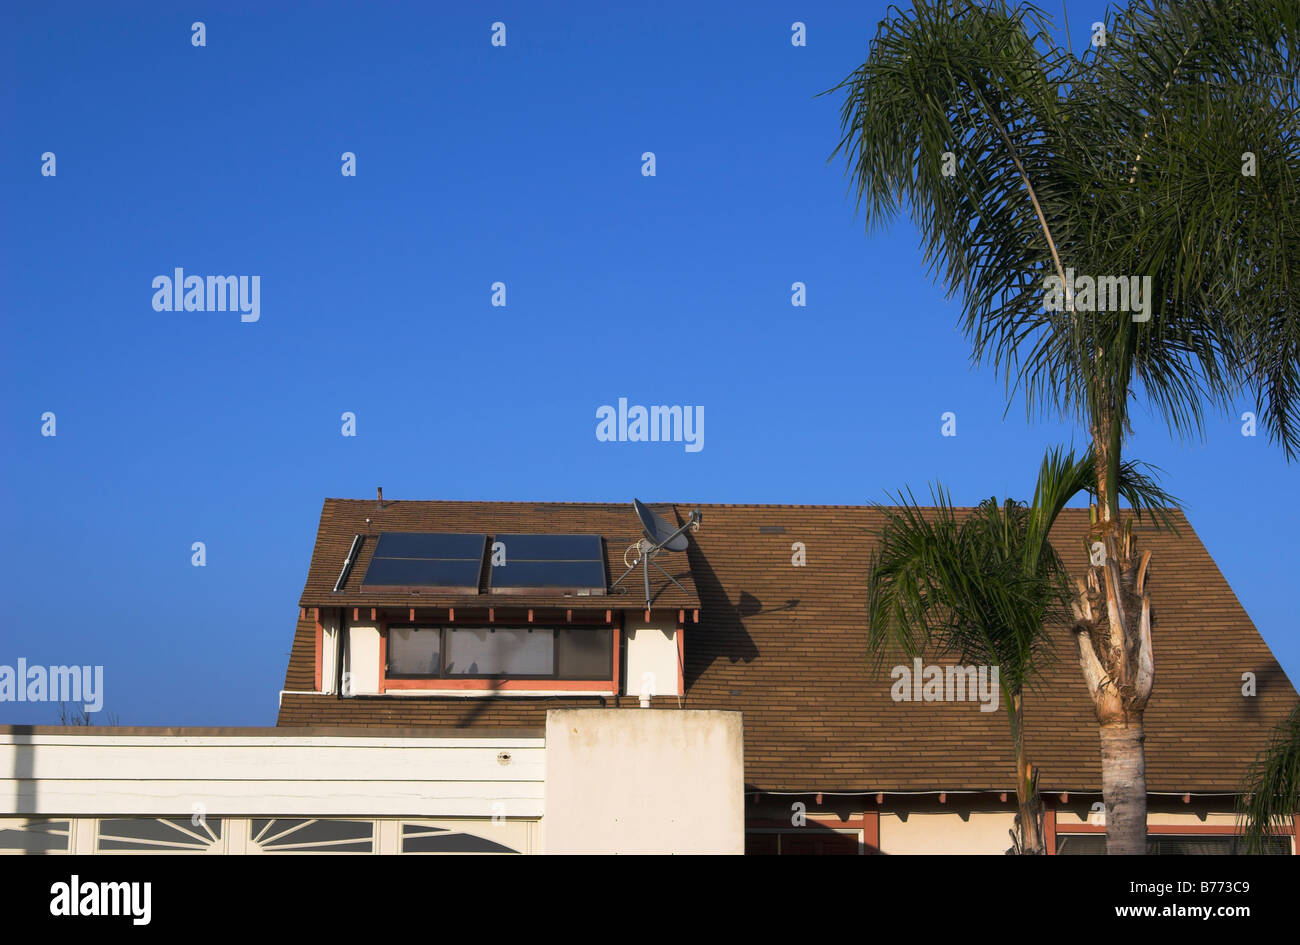 Residenziale riscaldatori solari, San Diego, California Immagini Stock